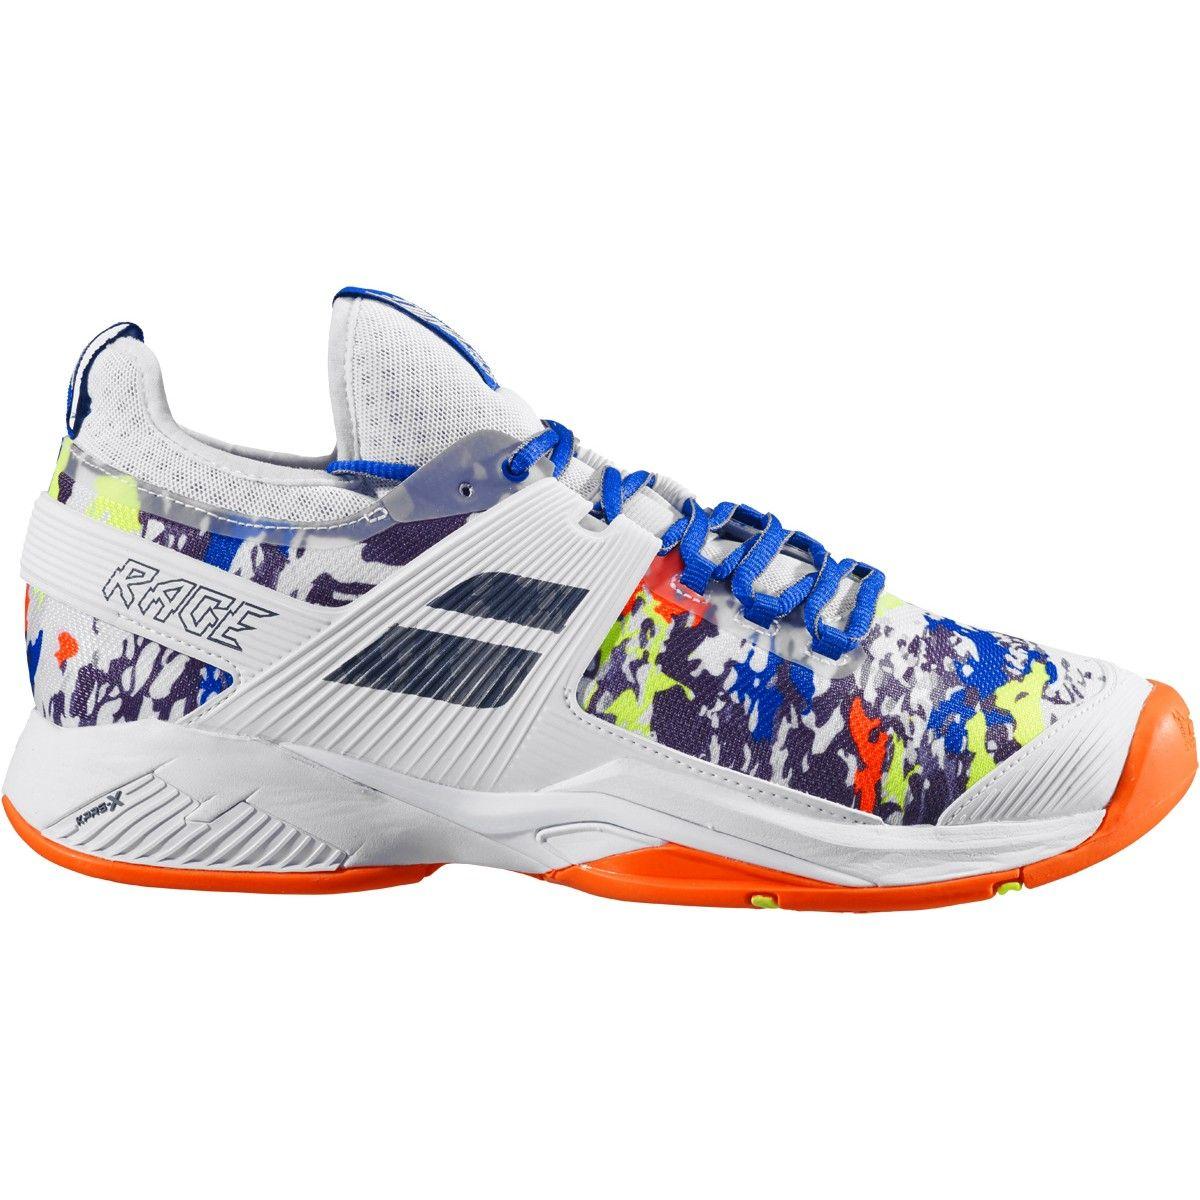 BABOLAT homme propulse Rage All Court Chaussures de Tennis